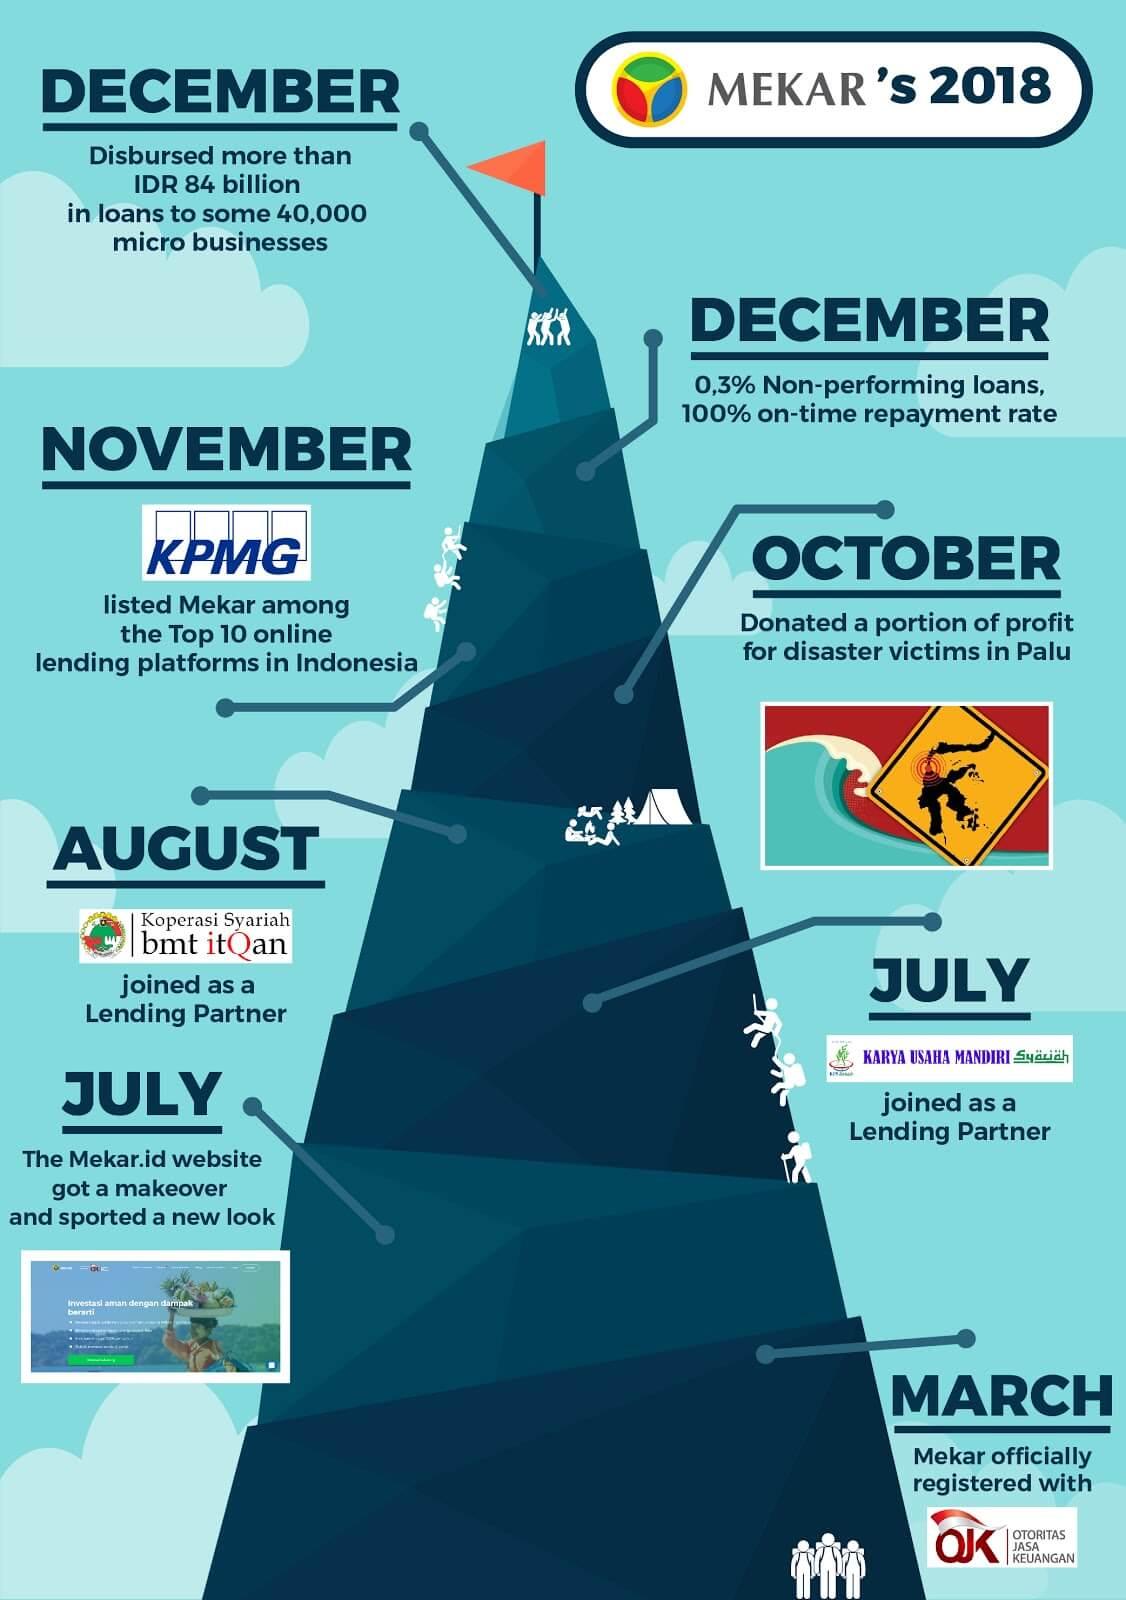 Infographic Mekar In 2018